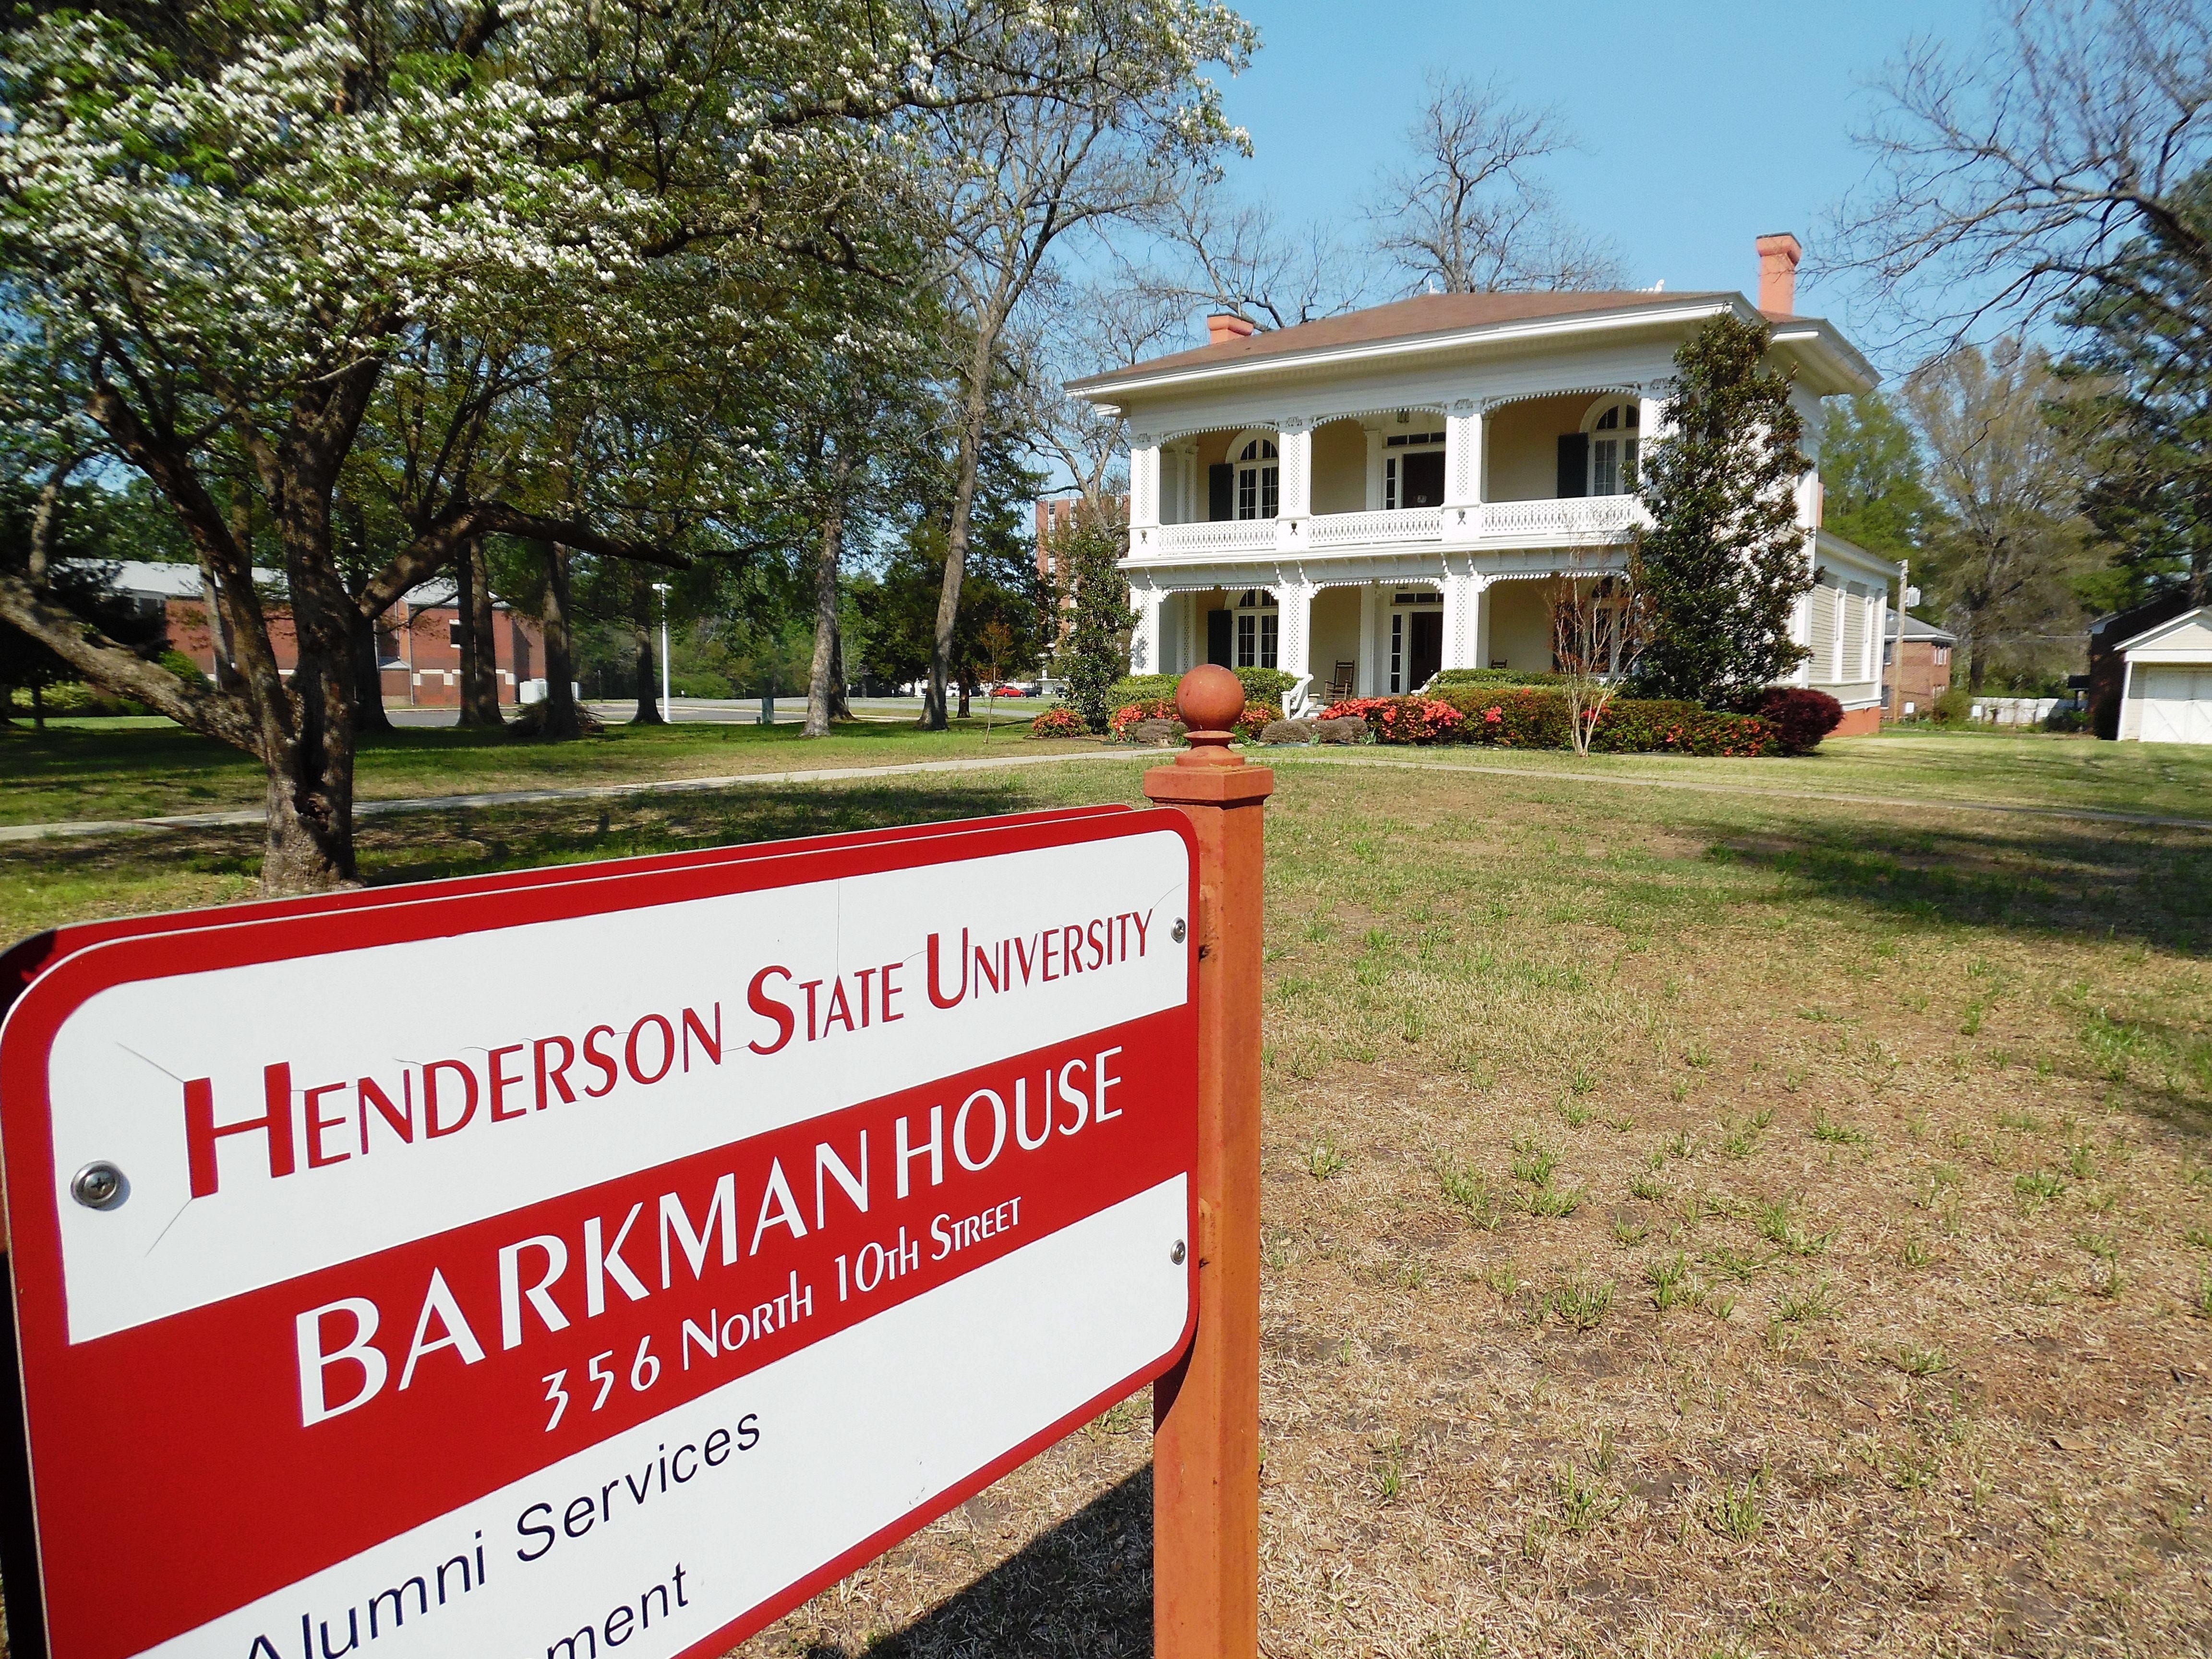 Barkman House Arkadelphia